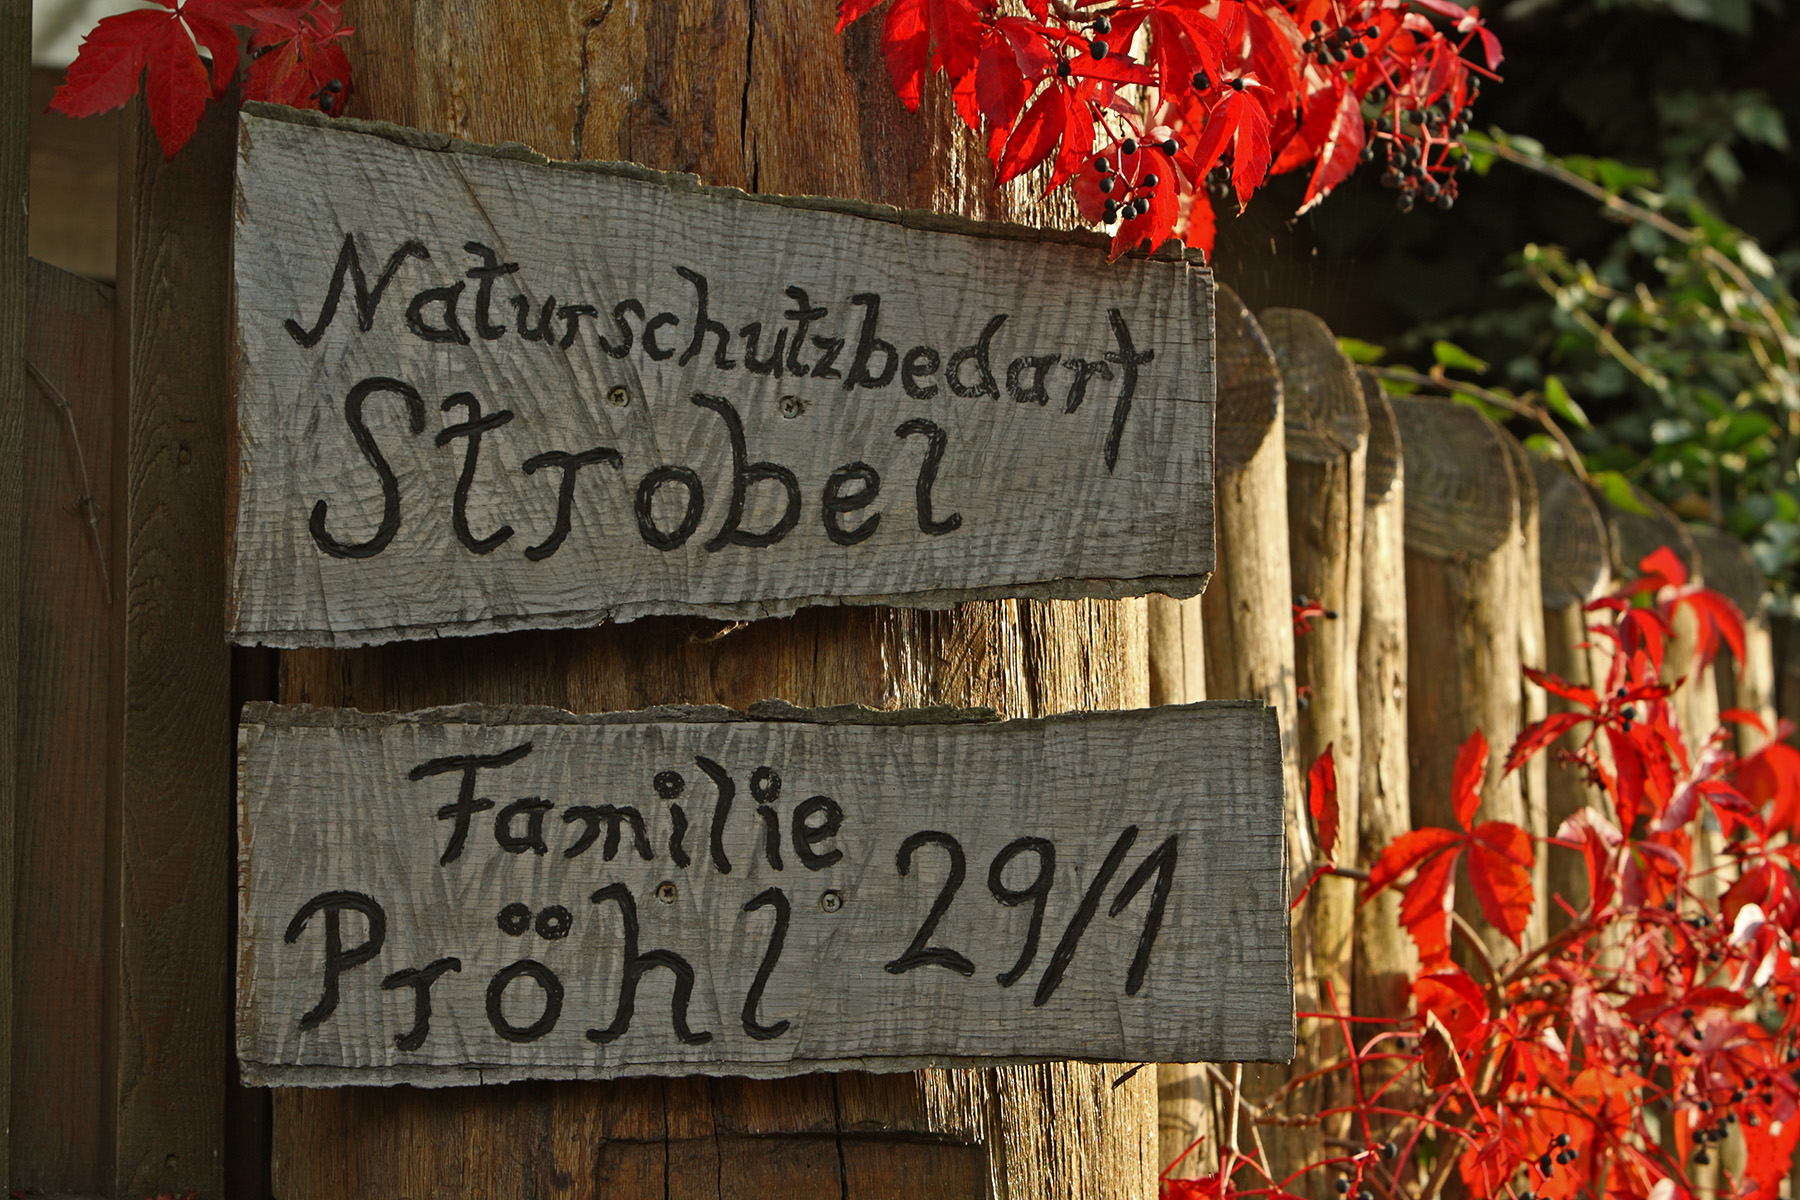 Naturschutzbedarf Strobel, Nitschkaer Straße 29, Schmölln OT Kummer